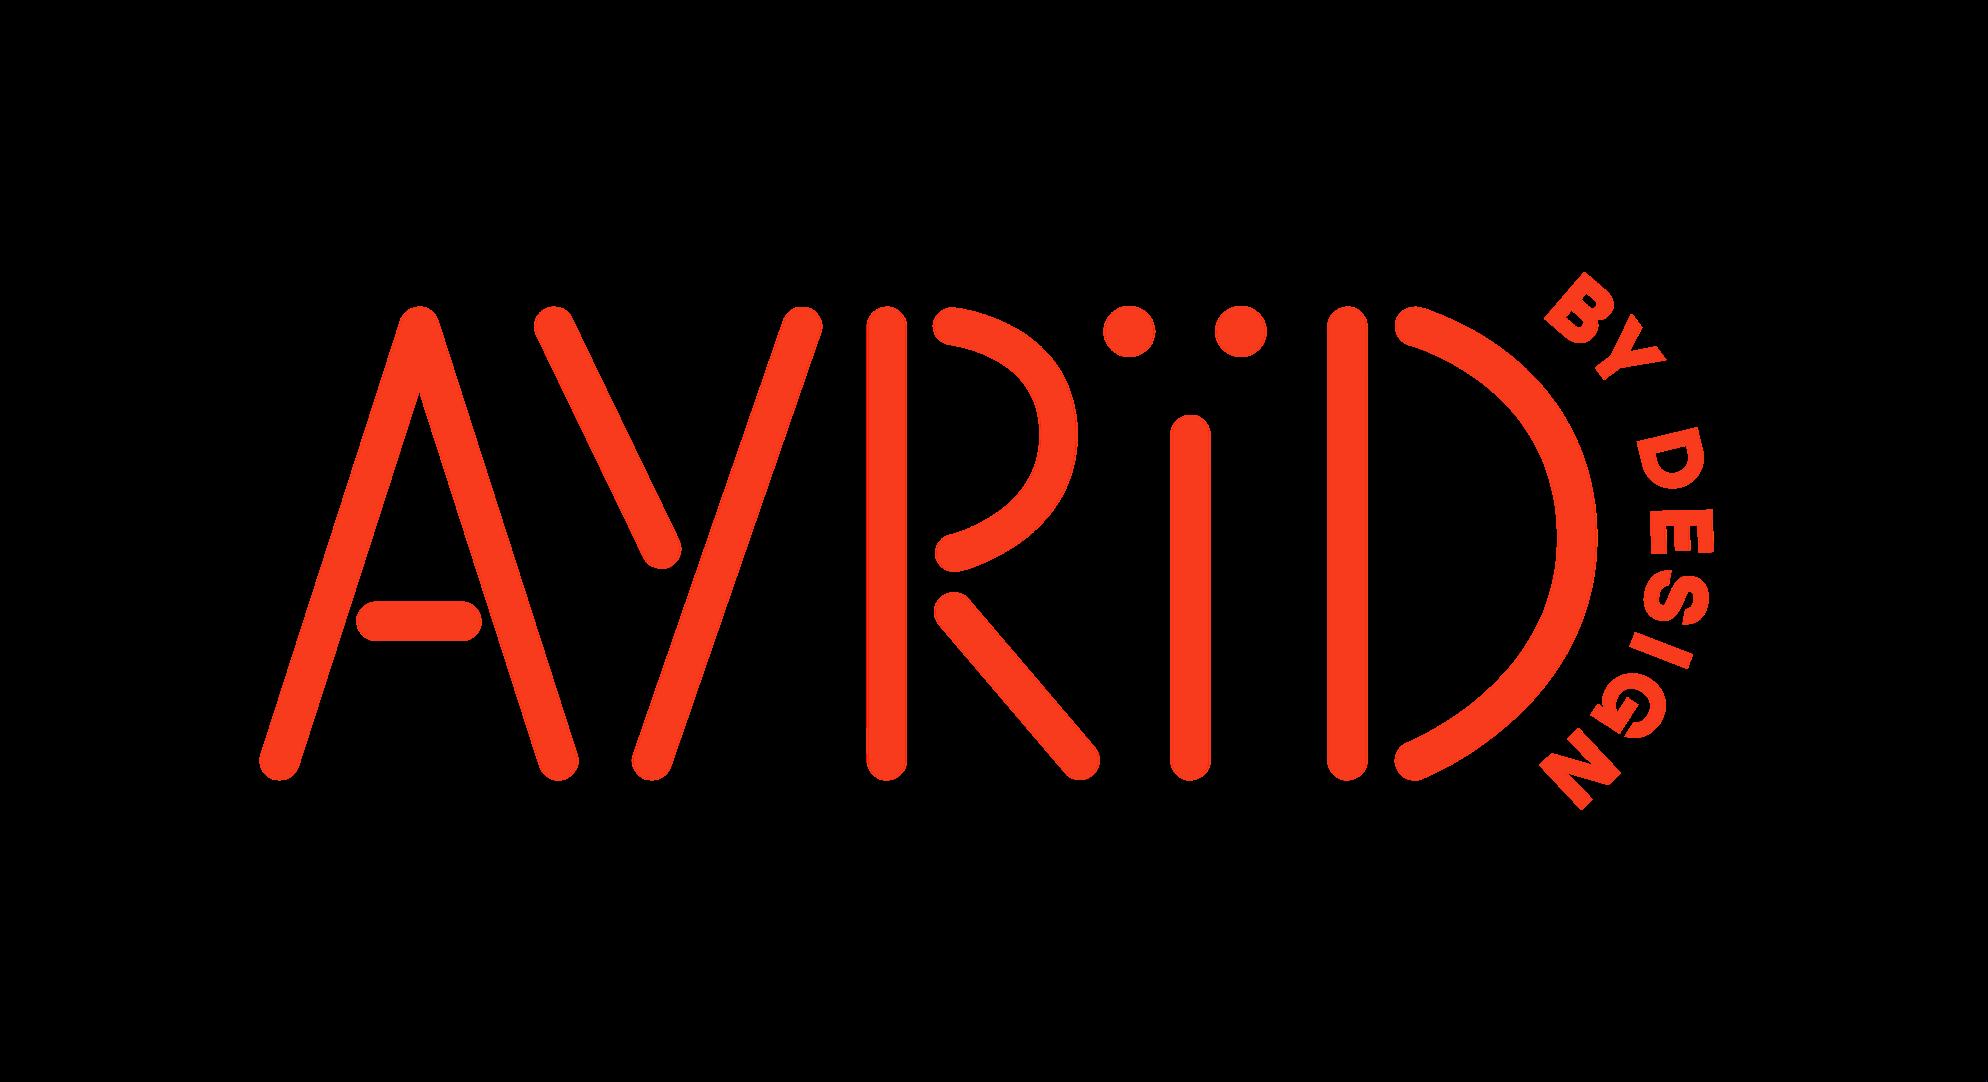 Ayrïd by Design